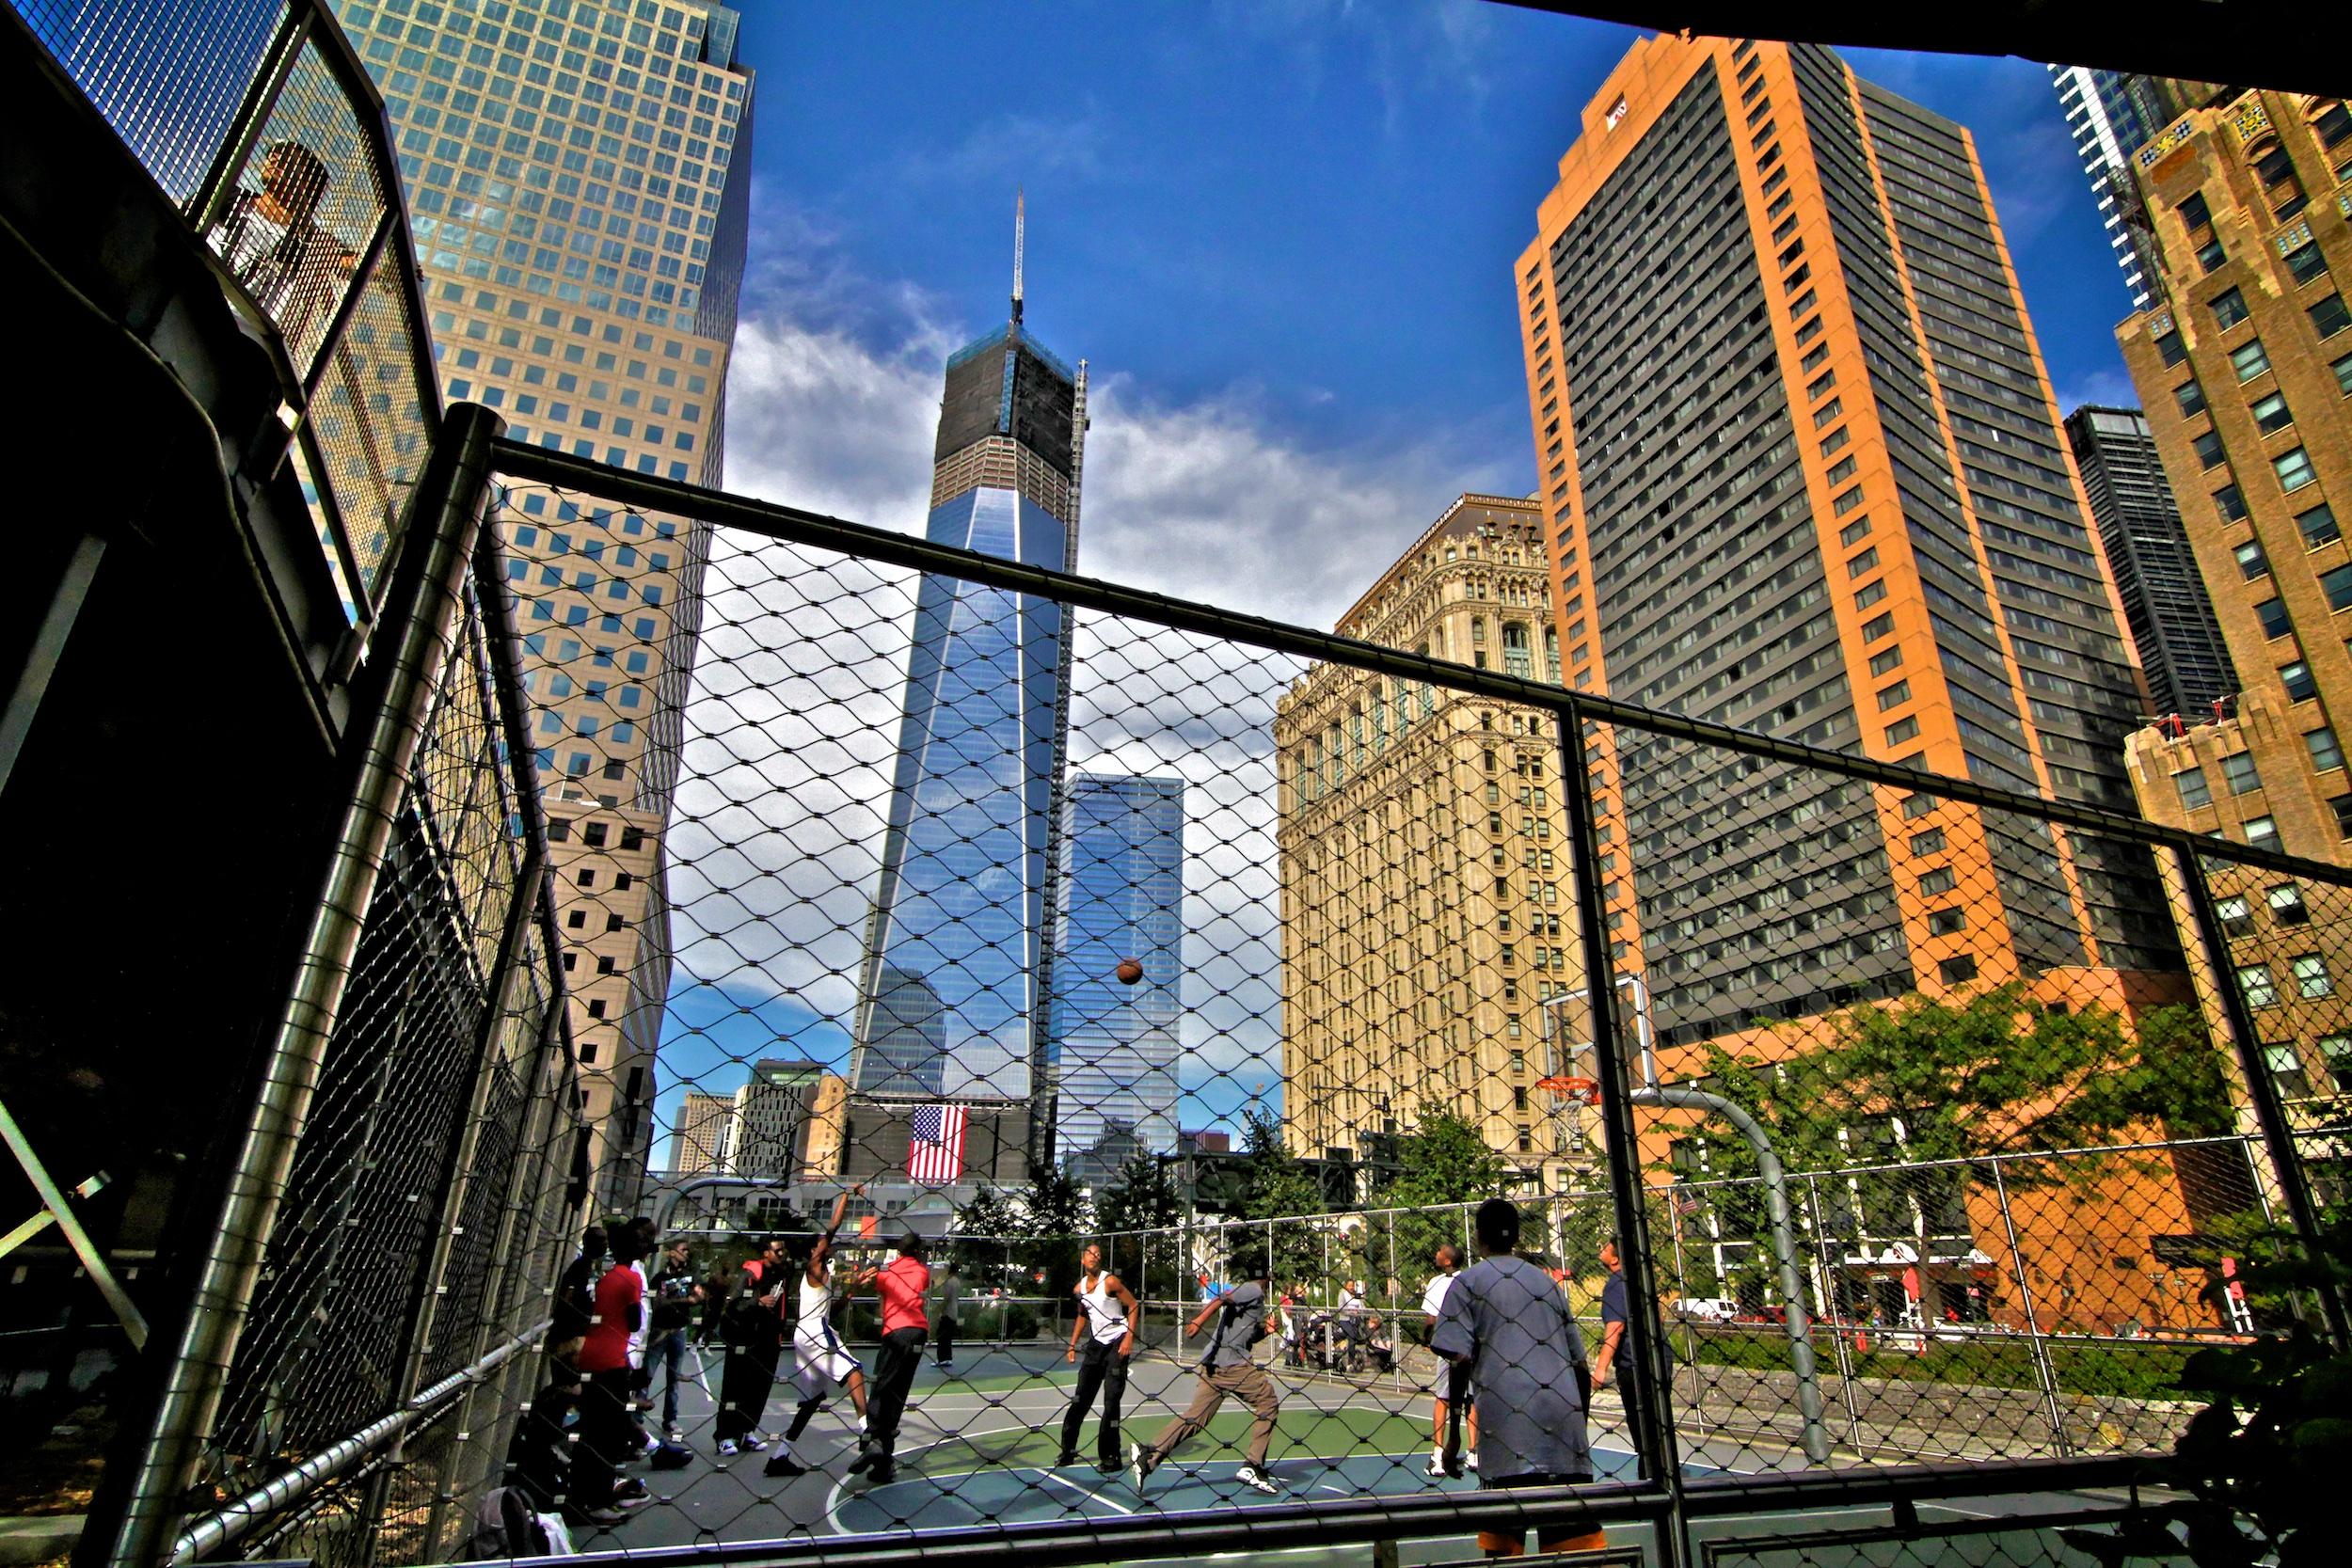 Basketball vor dem 1WTC